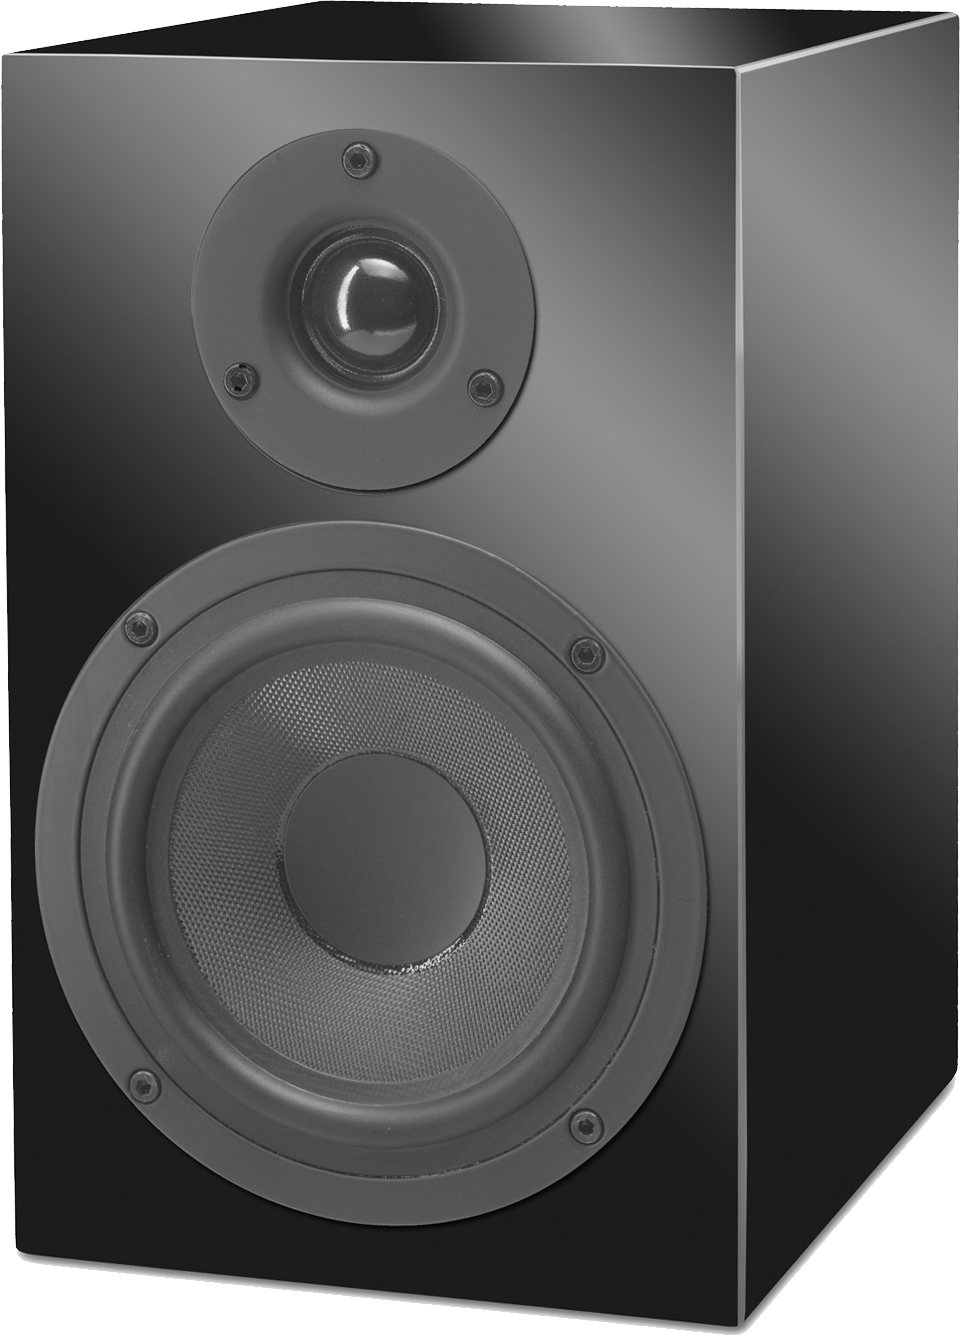 Audio Speaker Png Image Audio Speakers Speaker Speaker Box